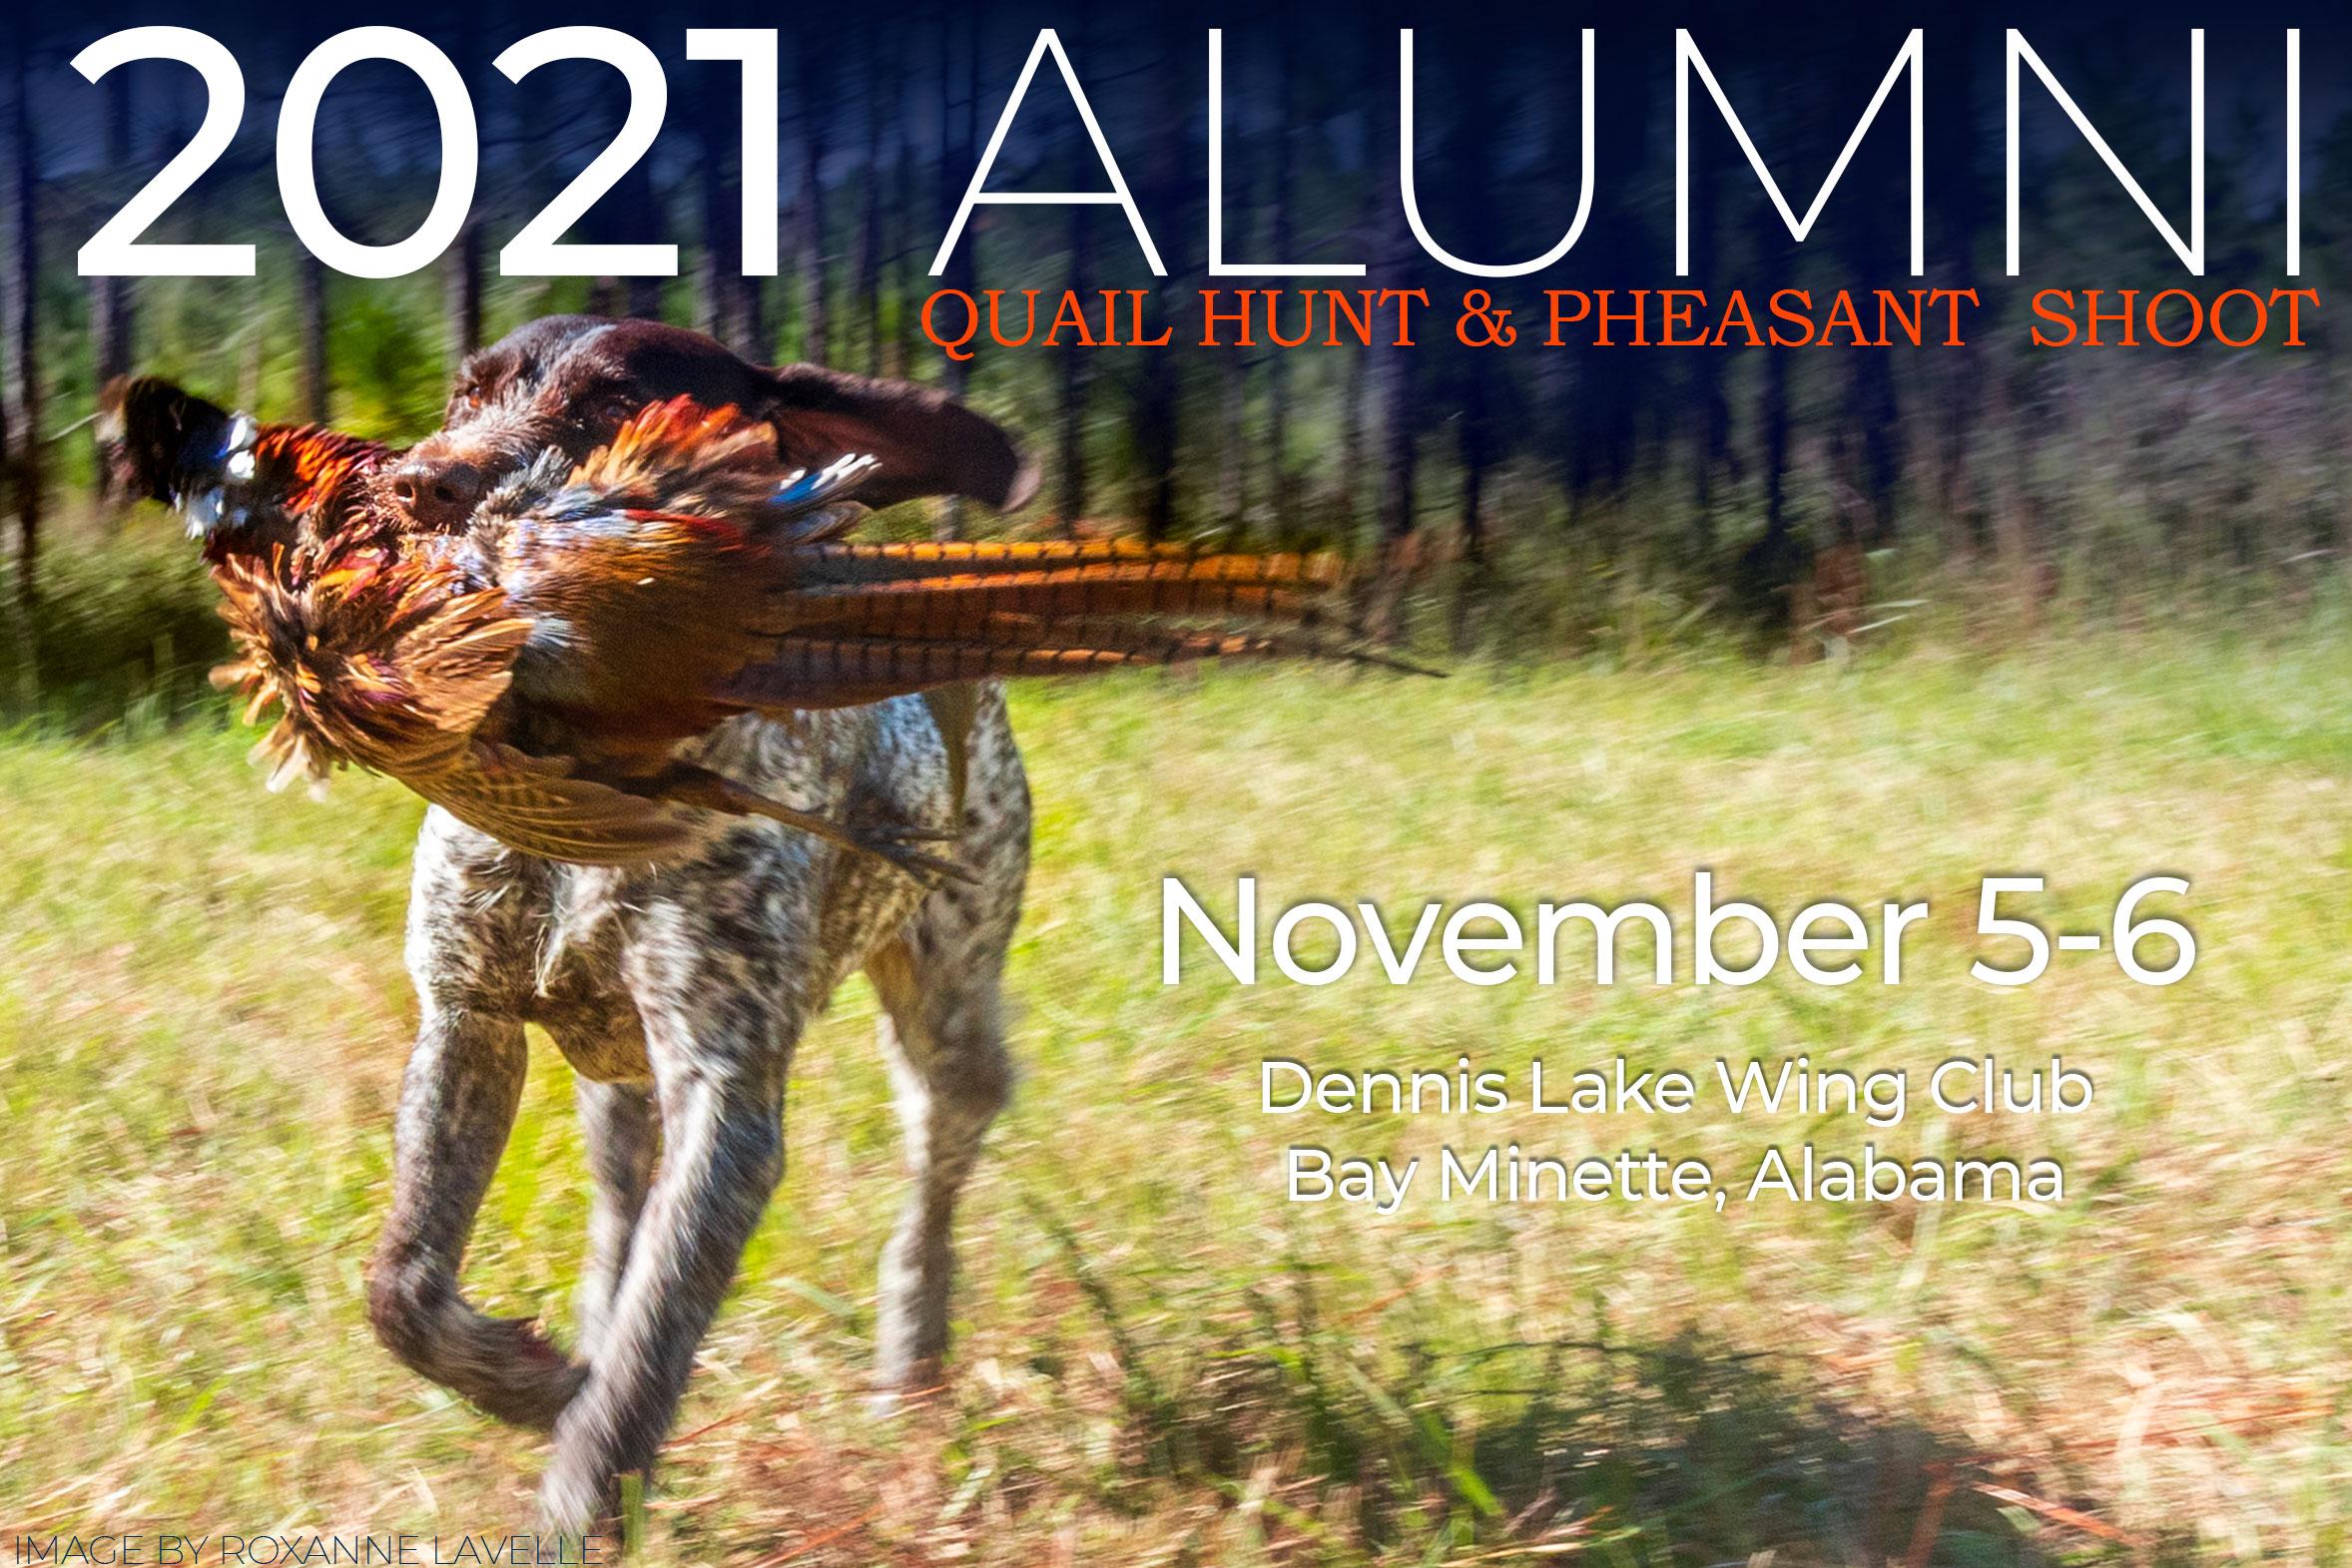 decorative image of 2021-Pheasant-Hunt-cover , Alumni Quail & Pheasant Hunt 2021-05-17 06:28:26